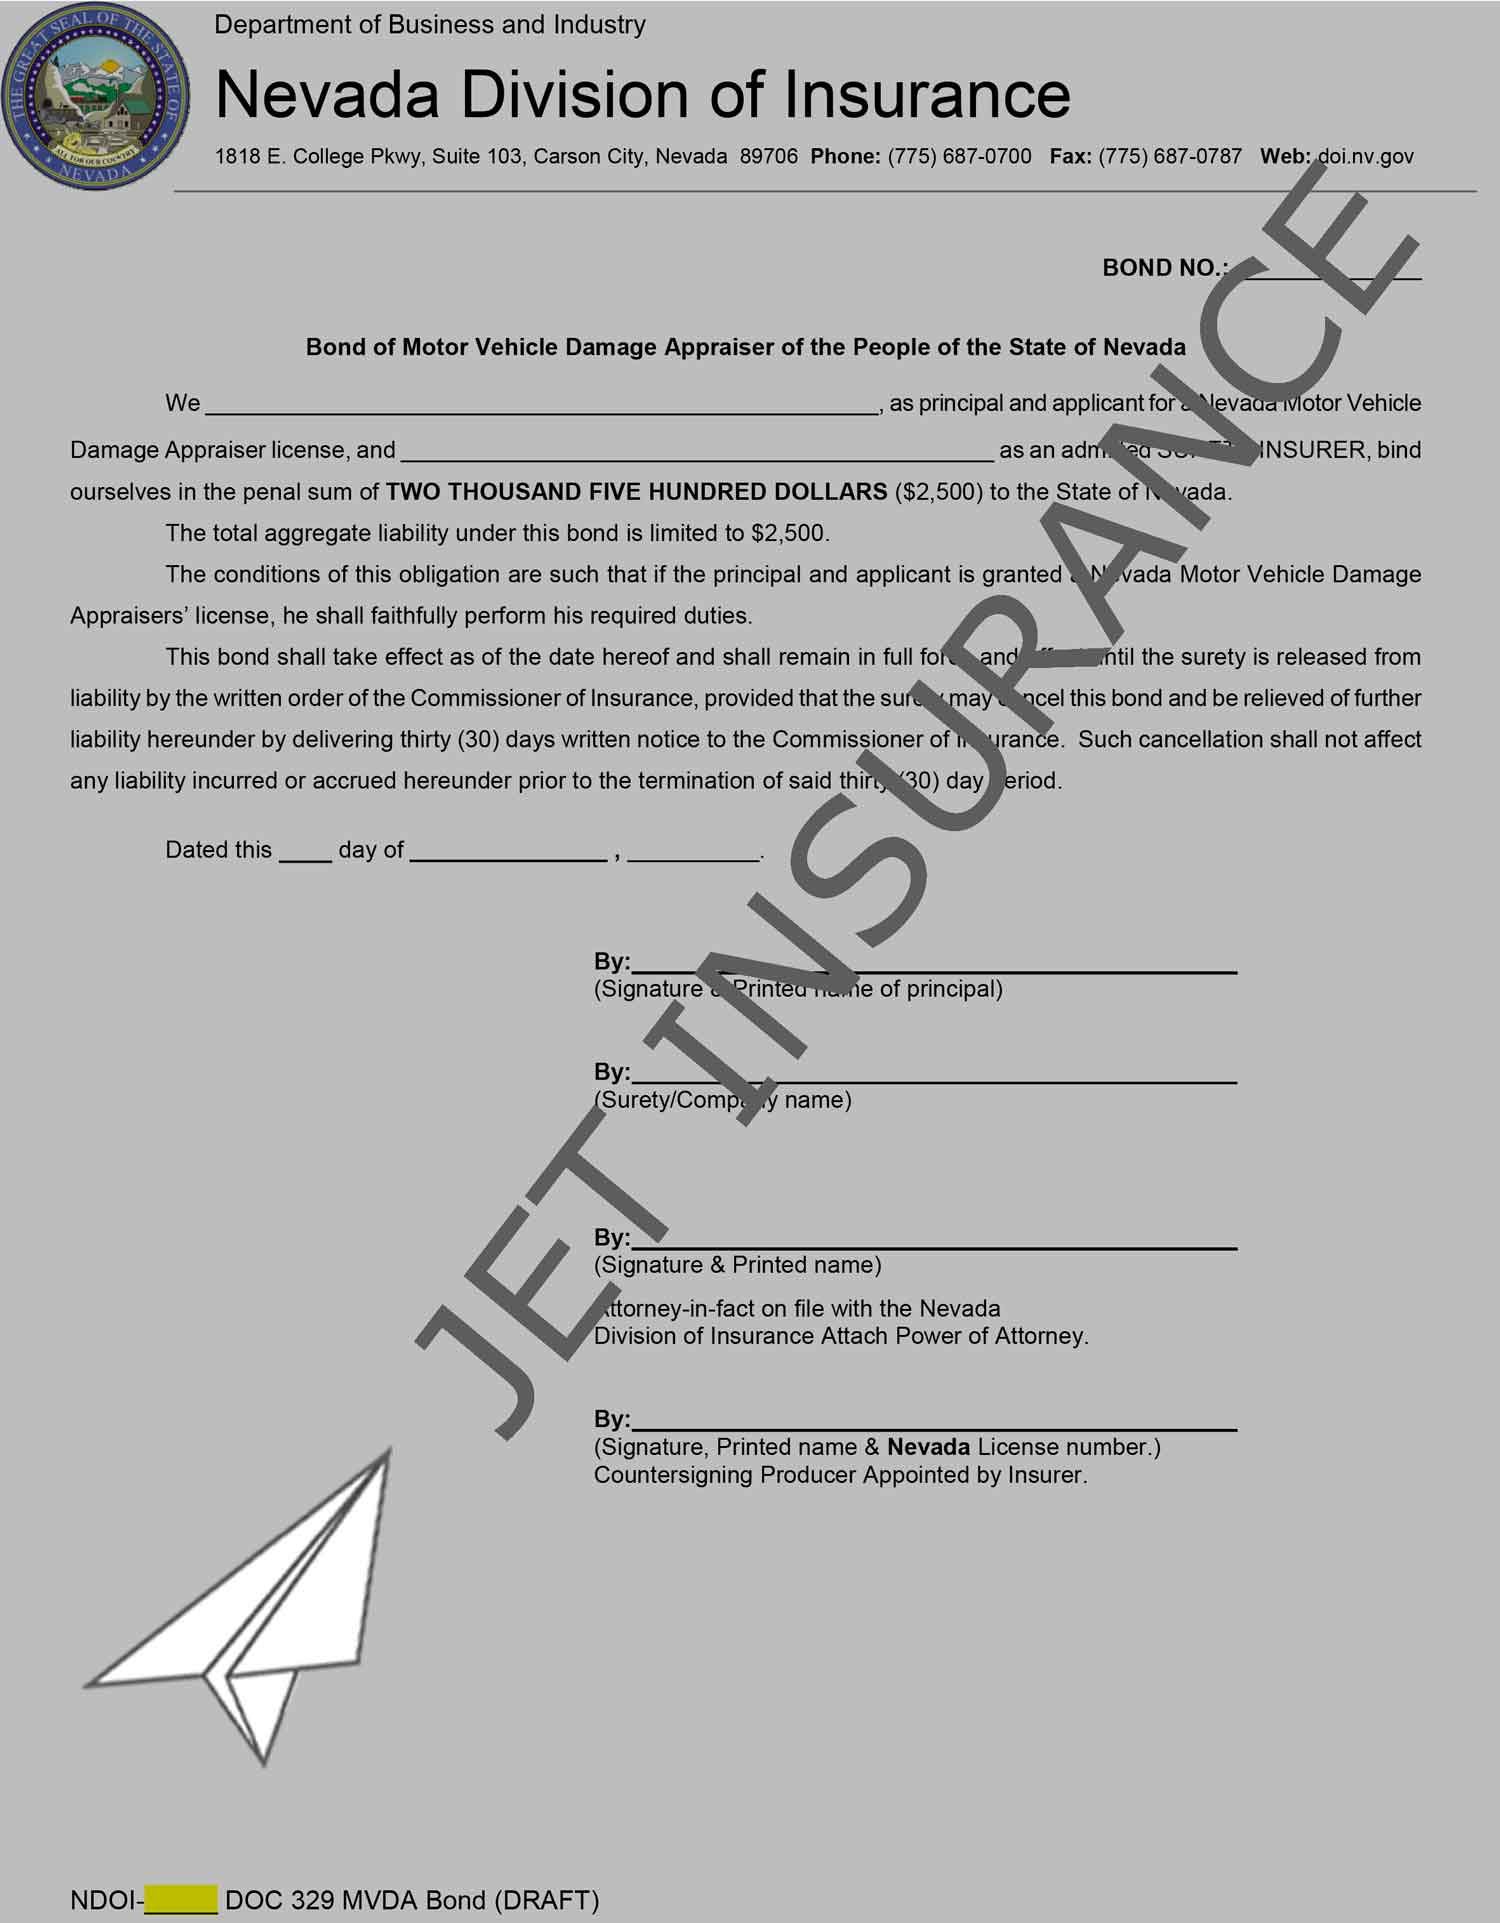 Nevada Motor Vehicle Damage Appraiser Bond Form